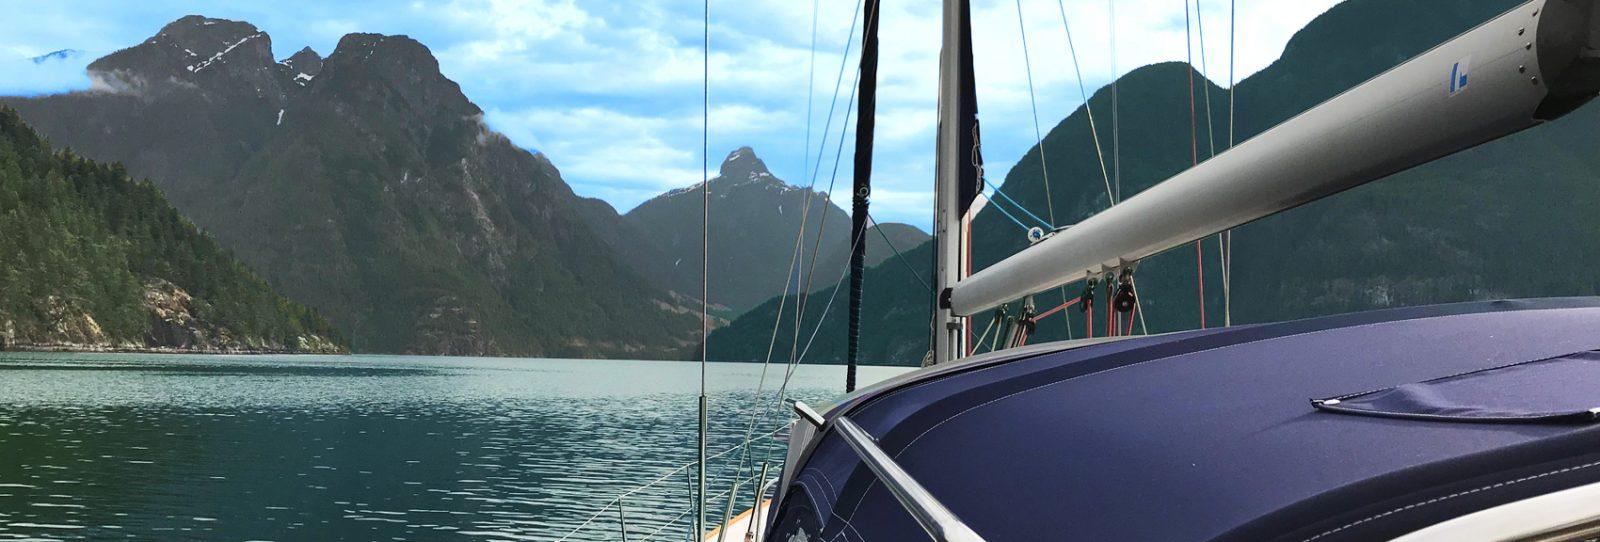 Inside Passage San Juan Islands Sailing Charters